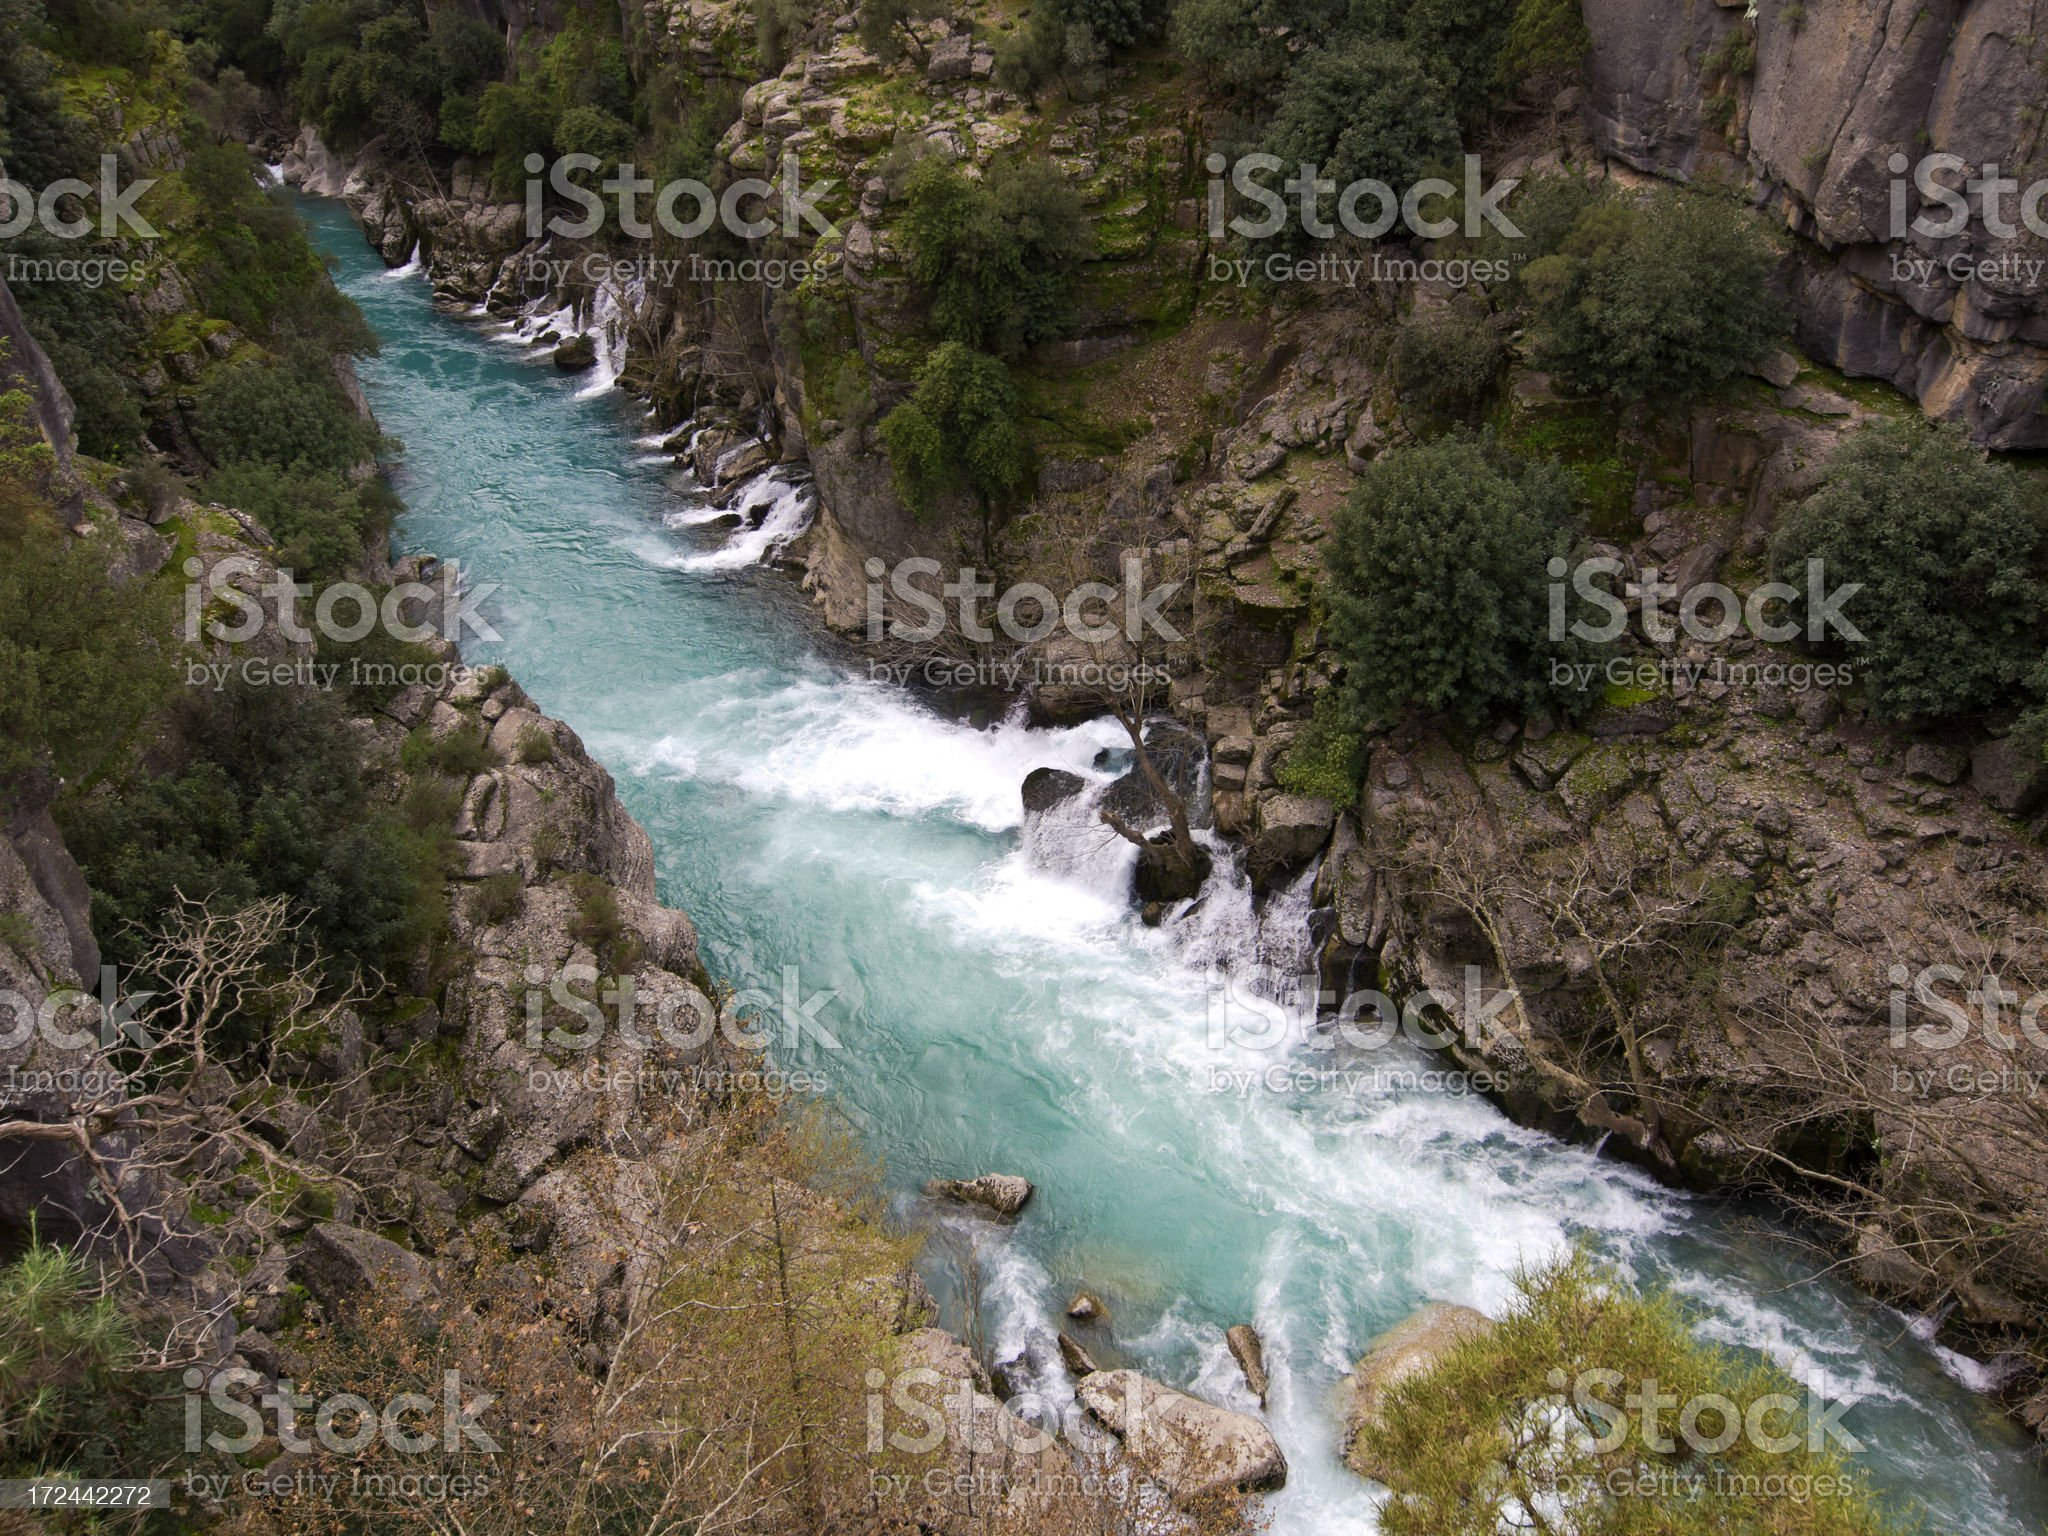 Koprolu Kanyon springs royalty-free stock photo